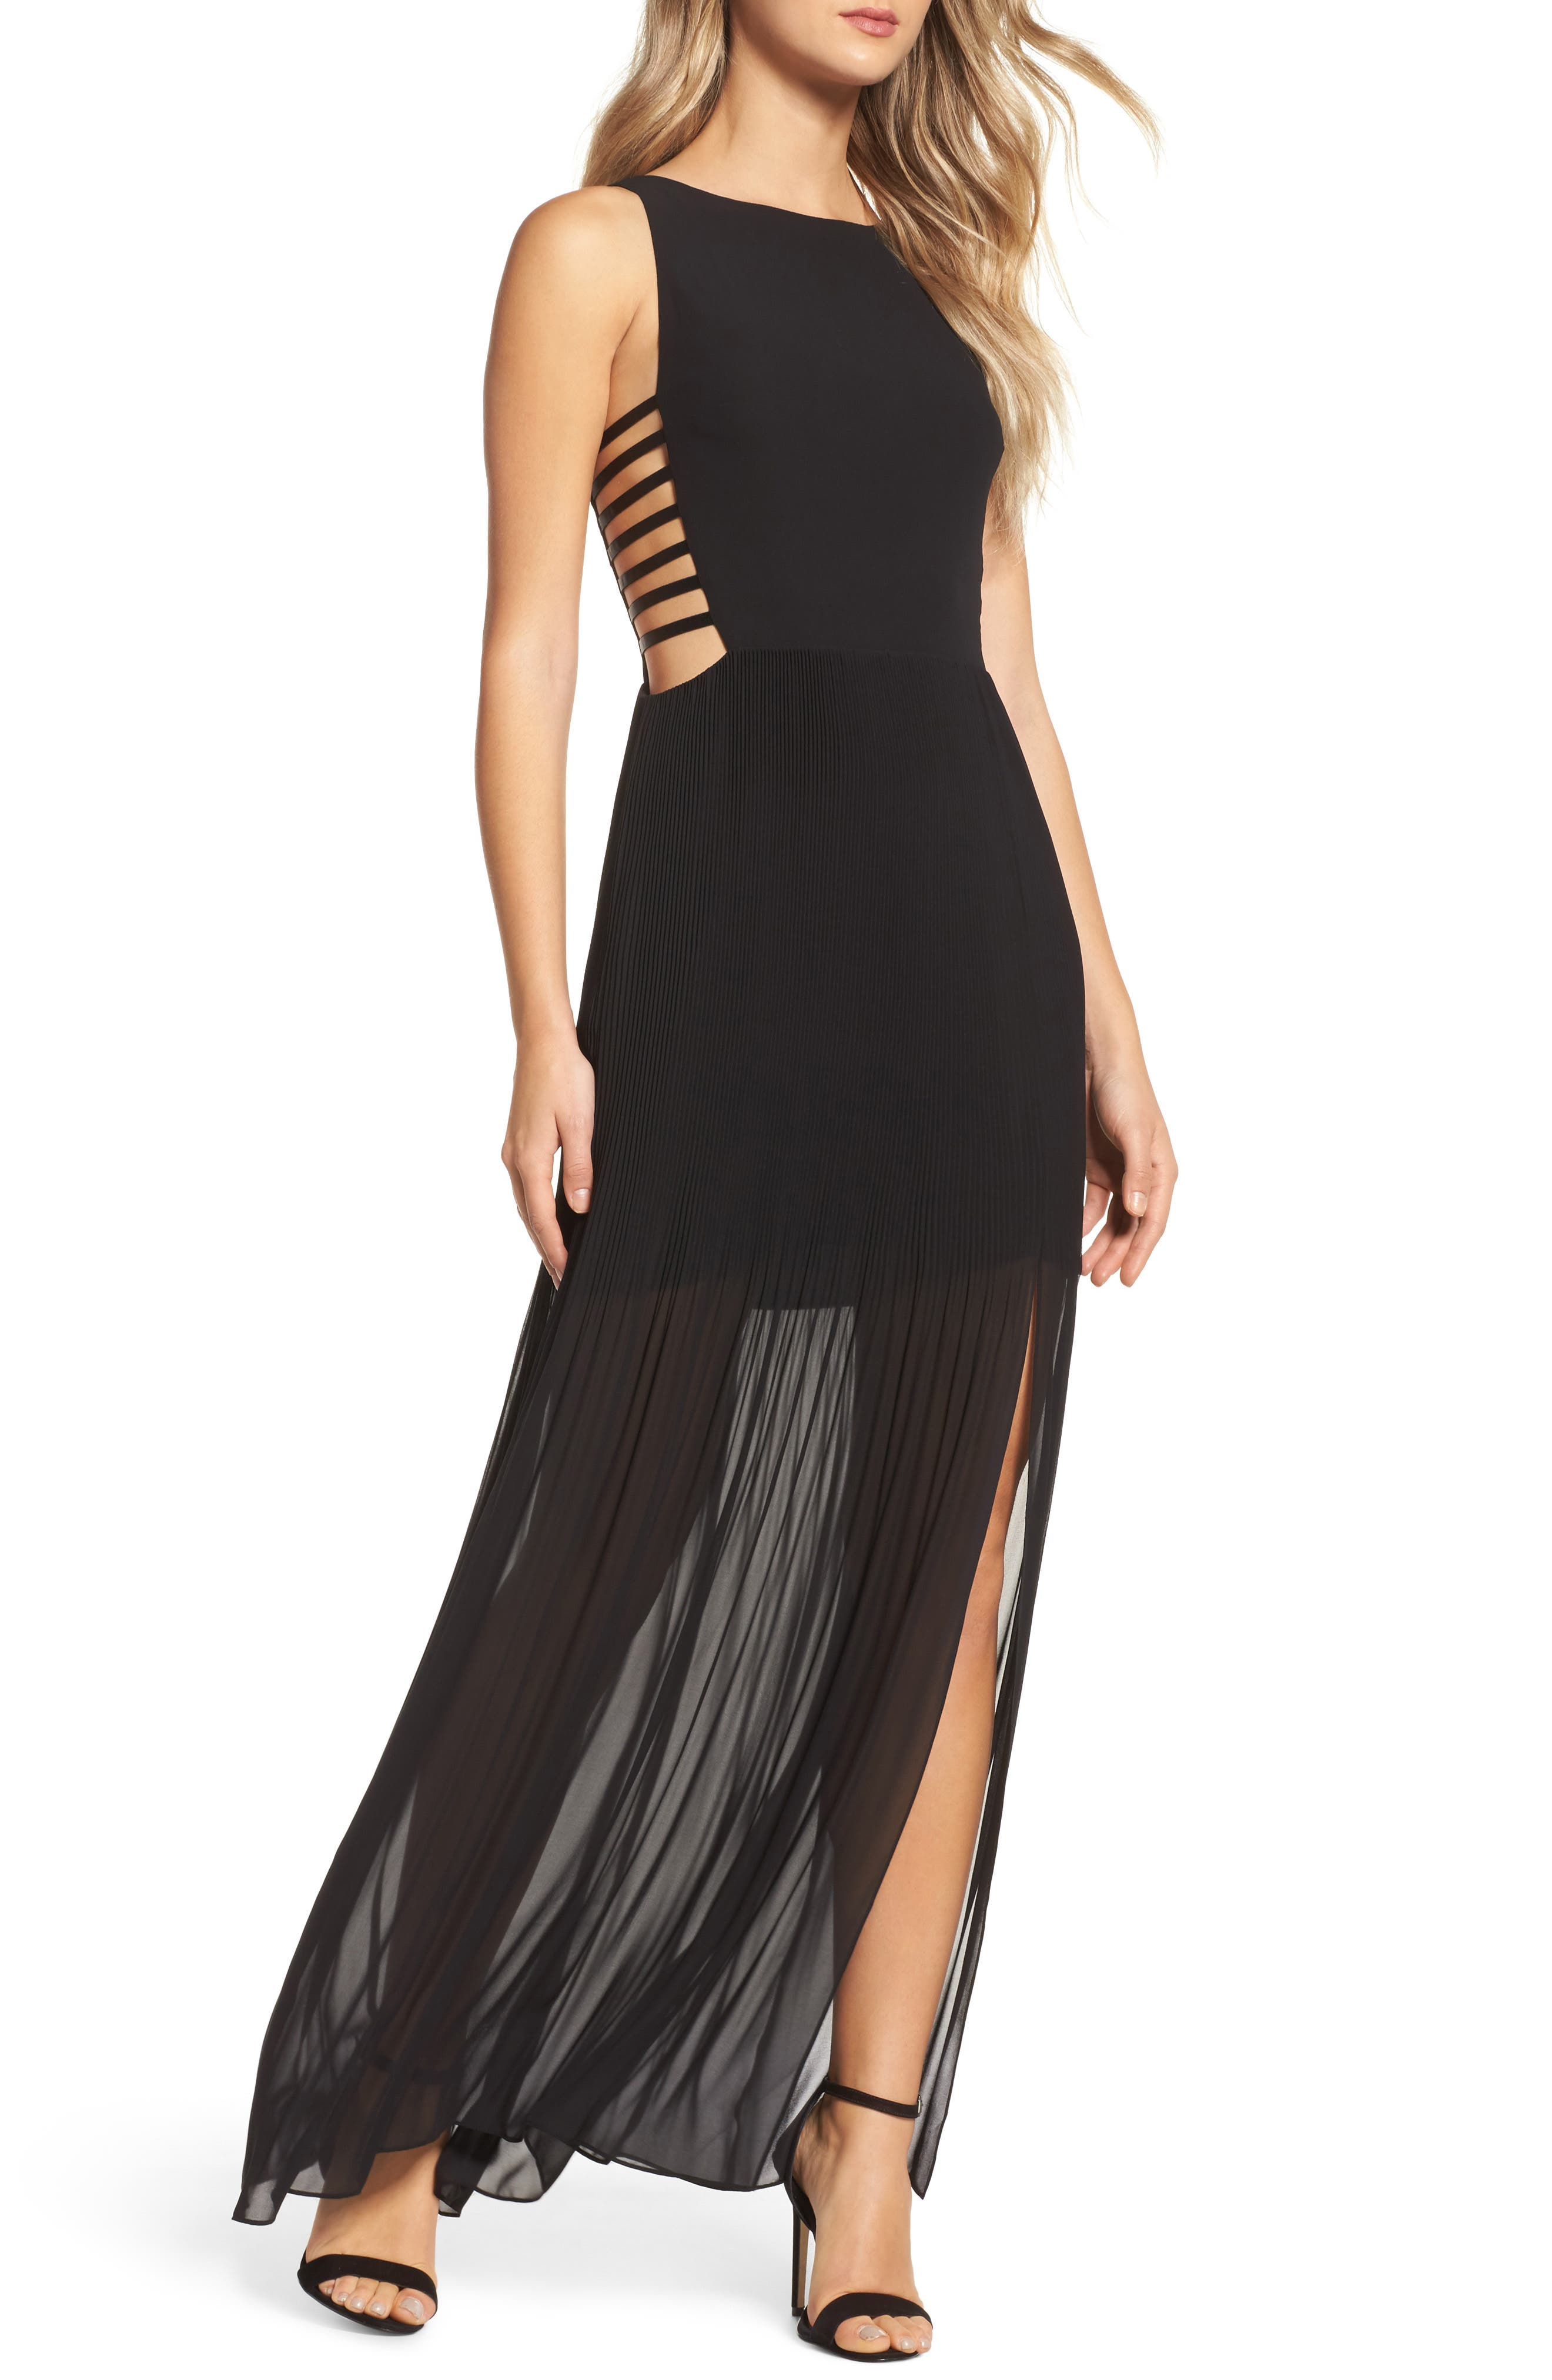 Sunset Blvd Maxi Dress,                             Main thumbnail 1, color,                             001